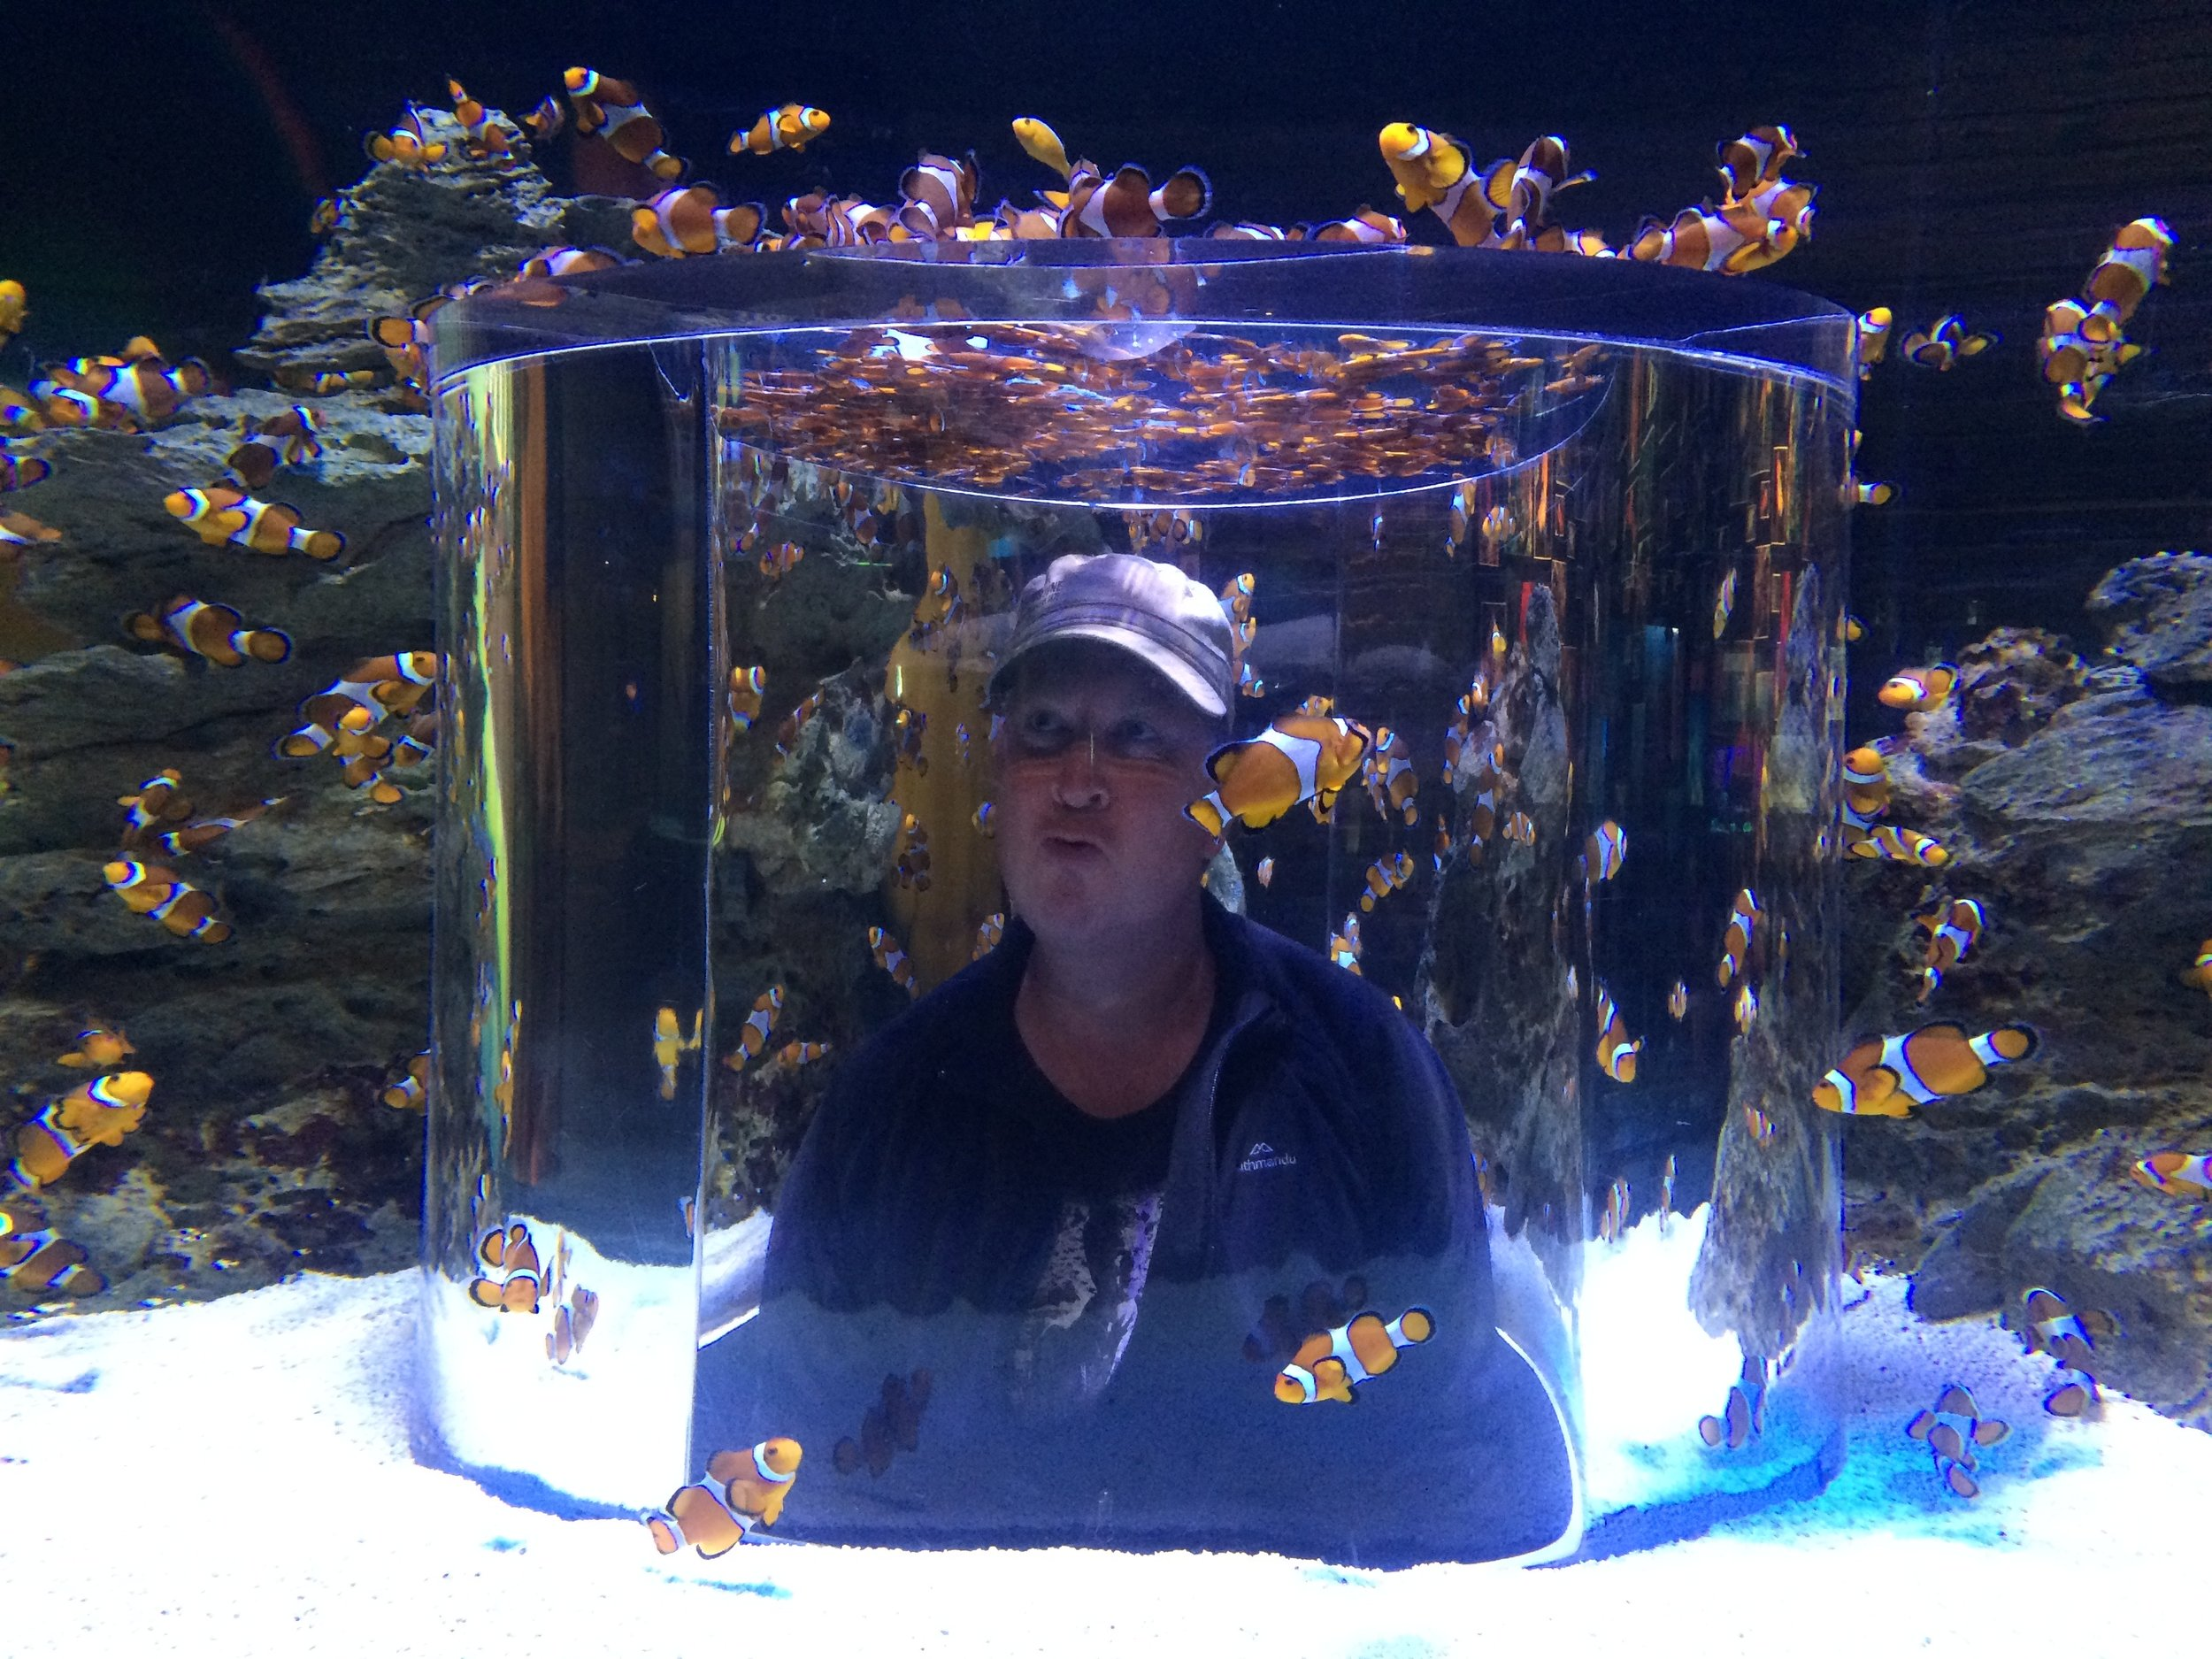 Found Nemo, it's that one!